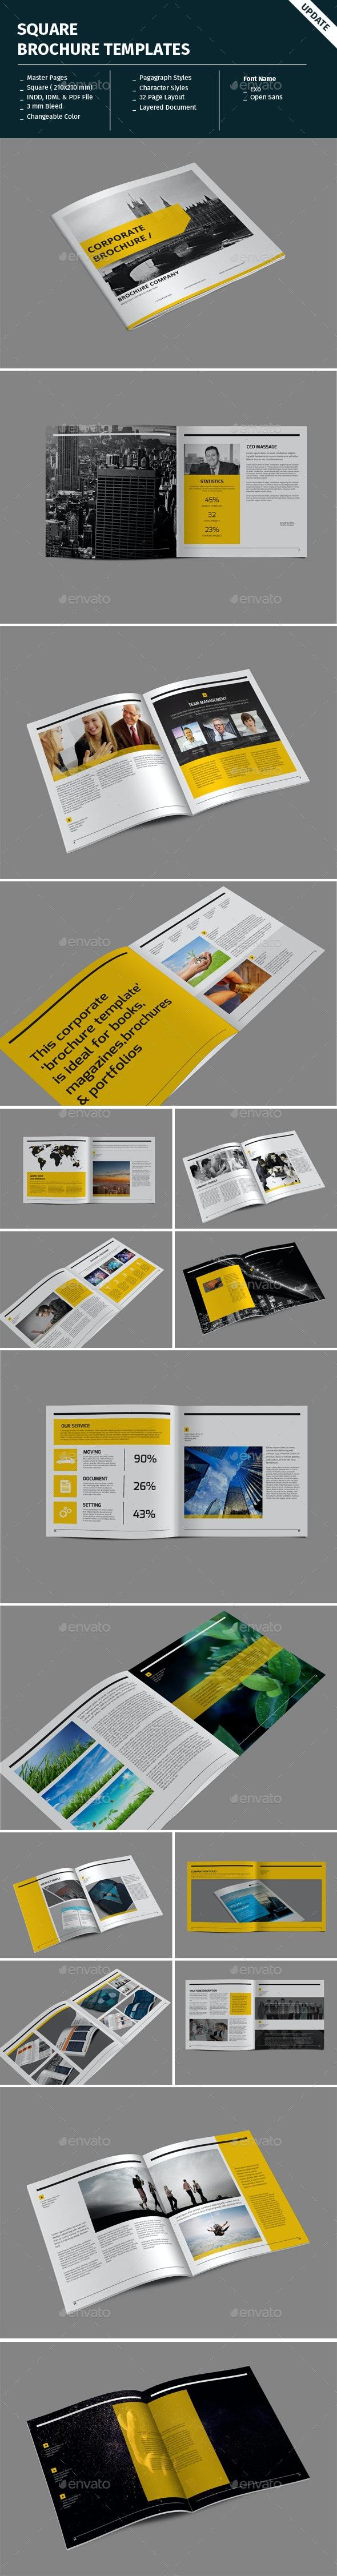 Square Brochure Templates - Corporate Brochures